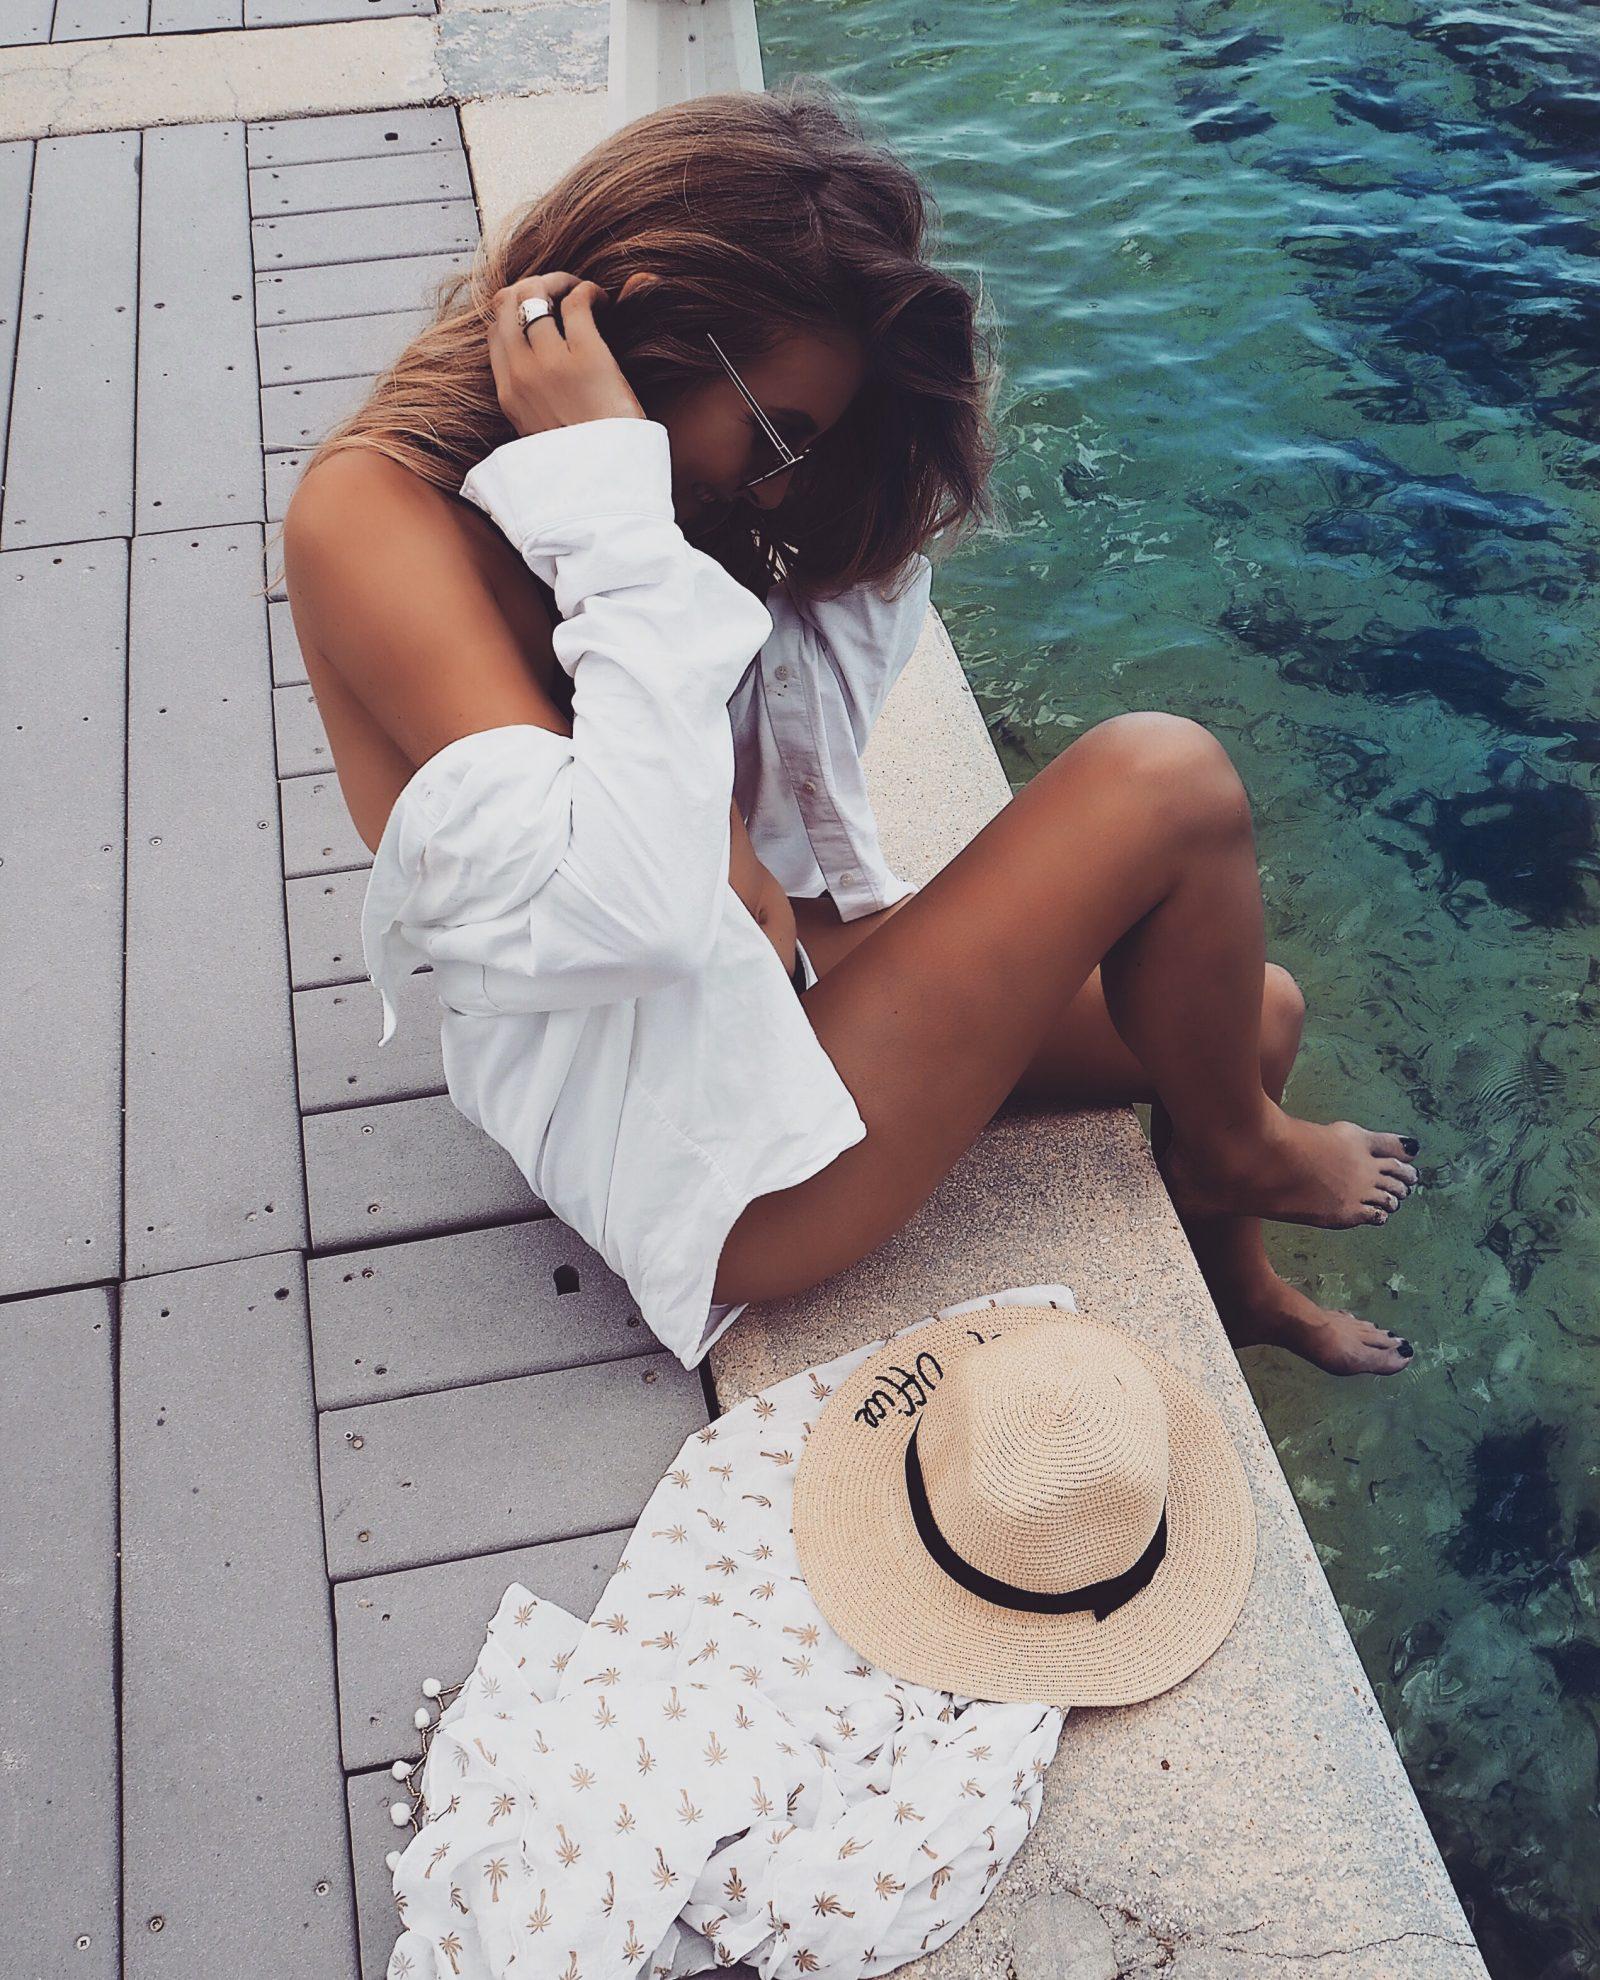 Heidi Klein Cayman Islands